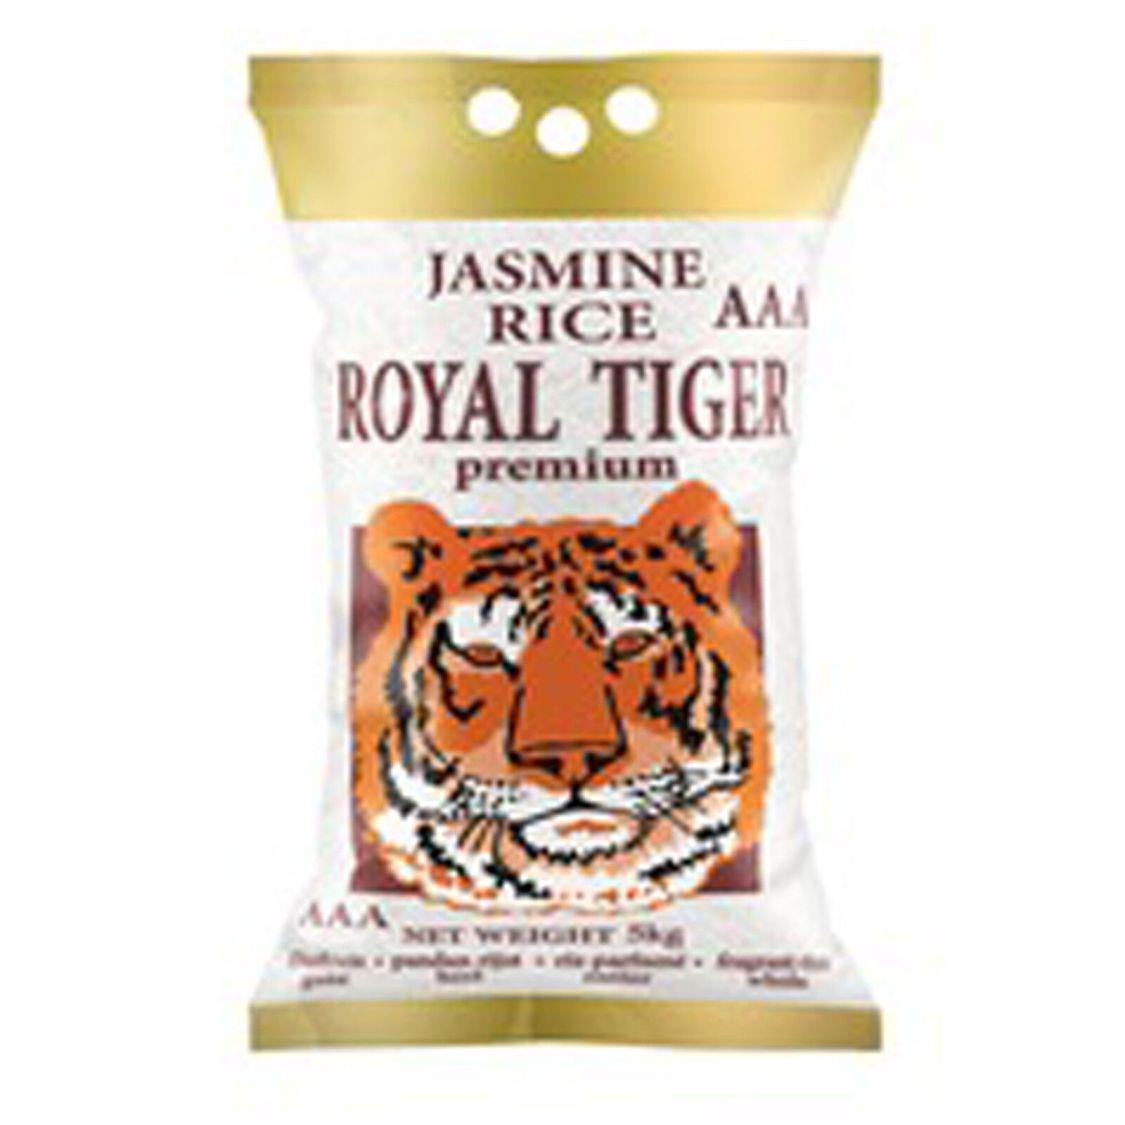 5kg Royal Tiger Duftreis Jasminreis Premium Qualität AAA Reis Jasmin Reis ganz